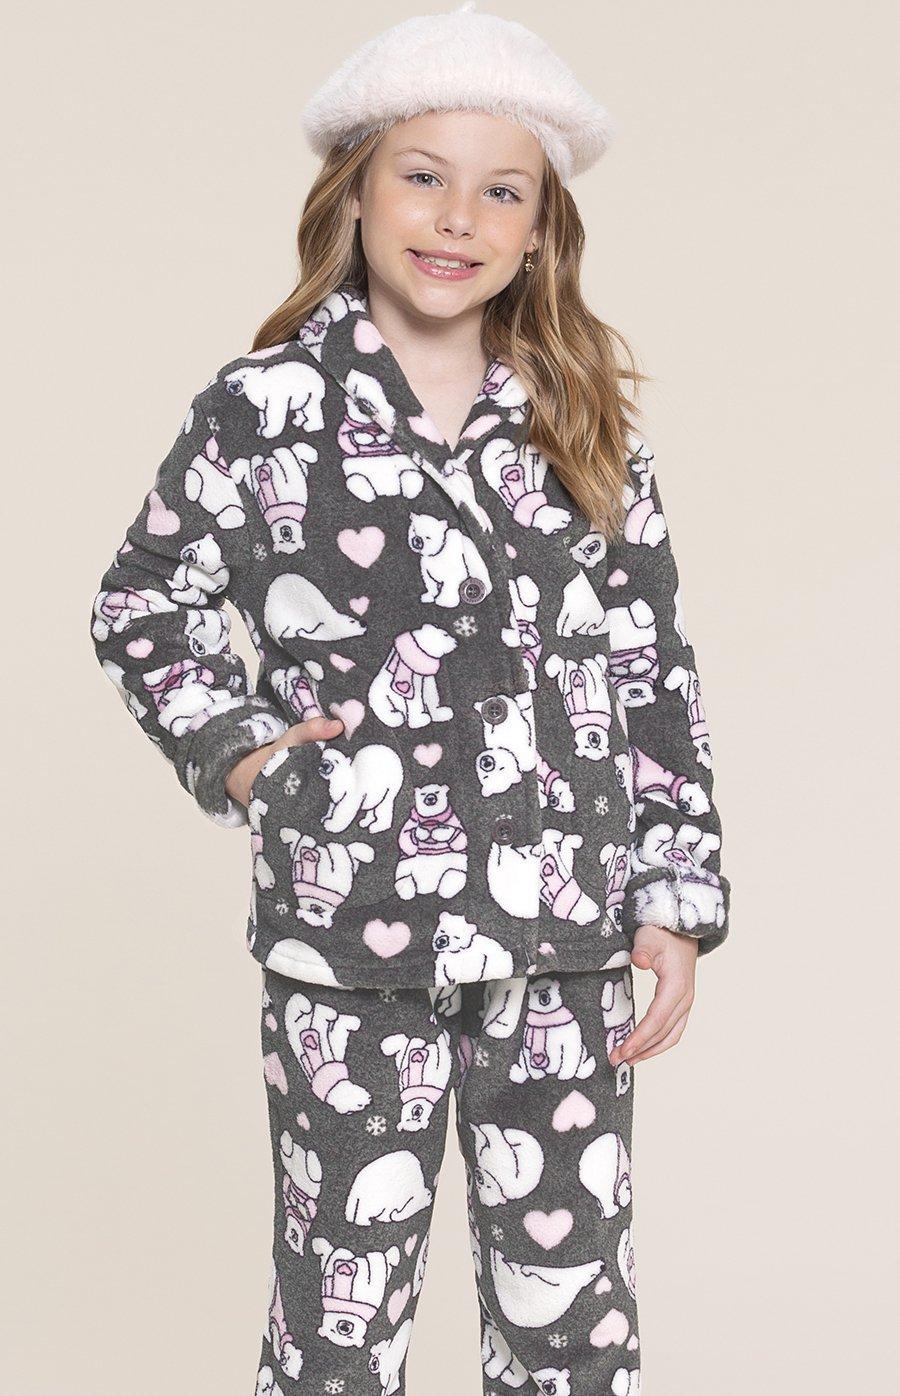 LIQUIDA Pijama Infantil Soft Urso Fofolete Inverno